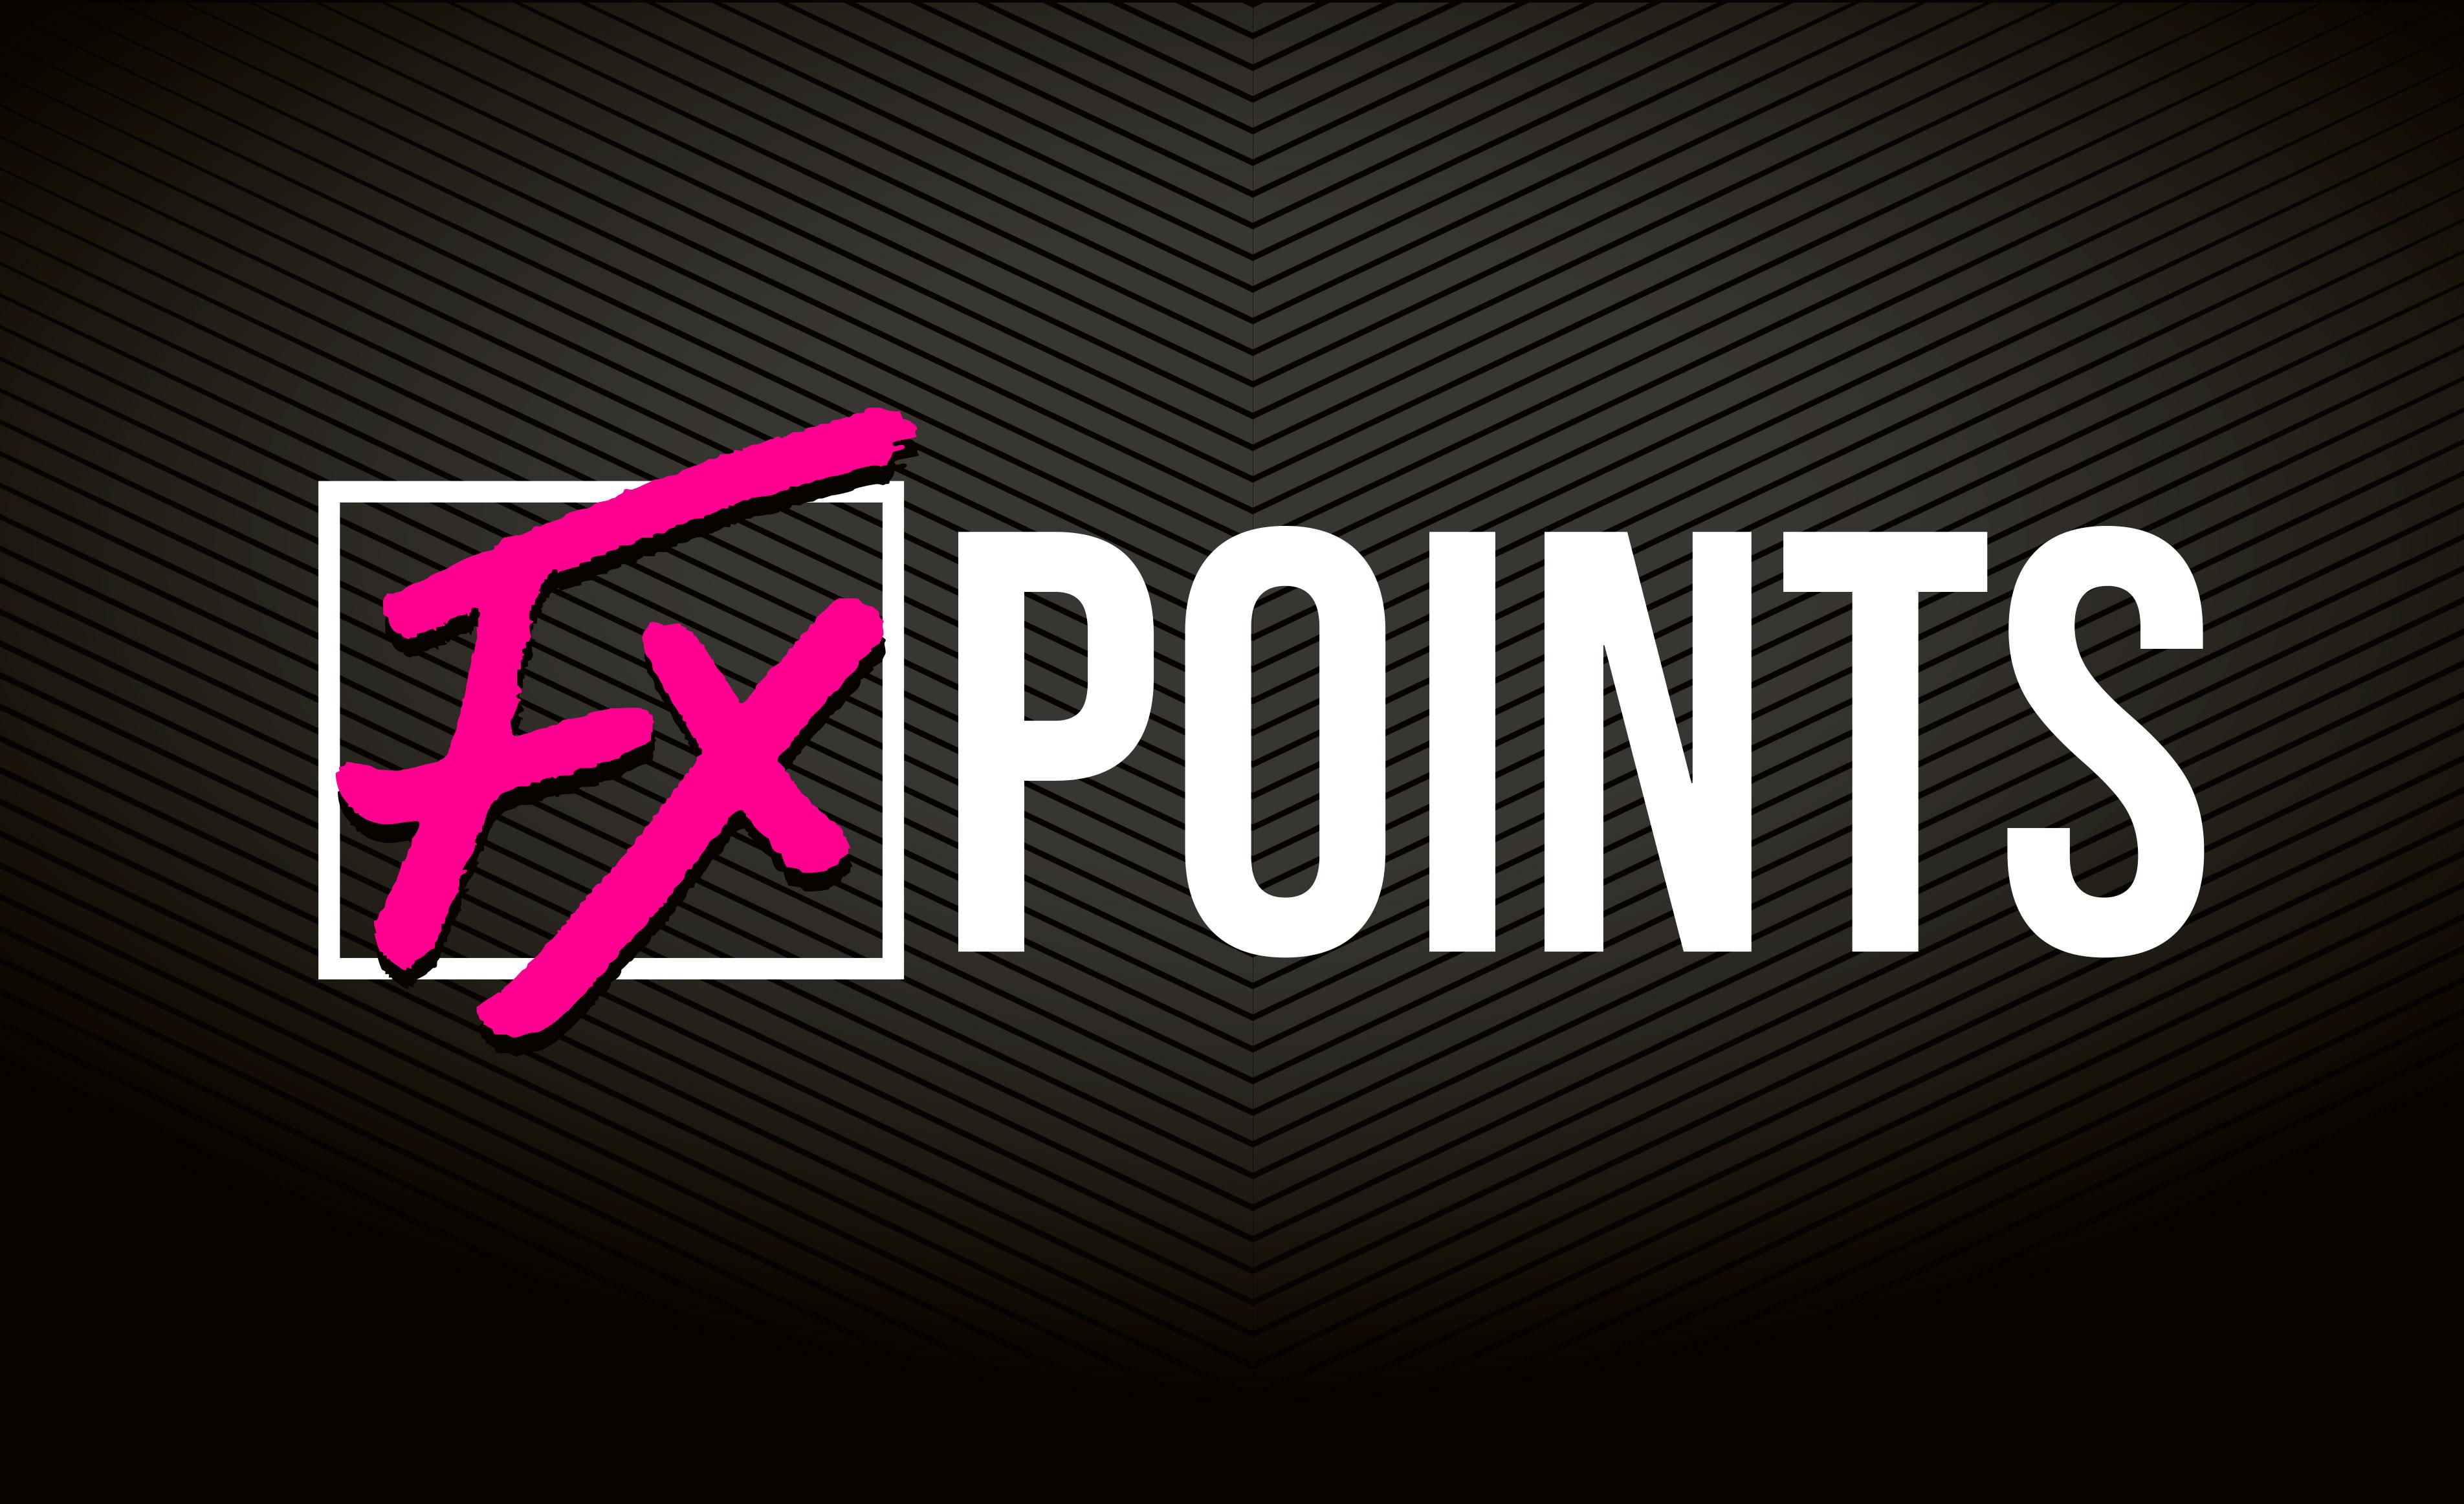 FX Points